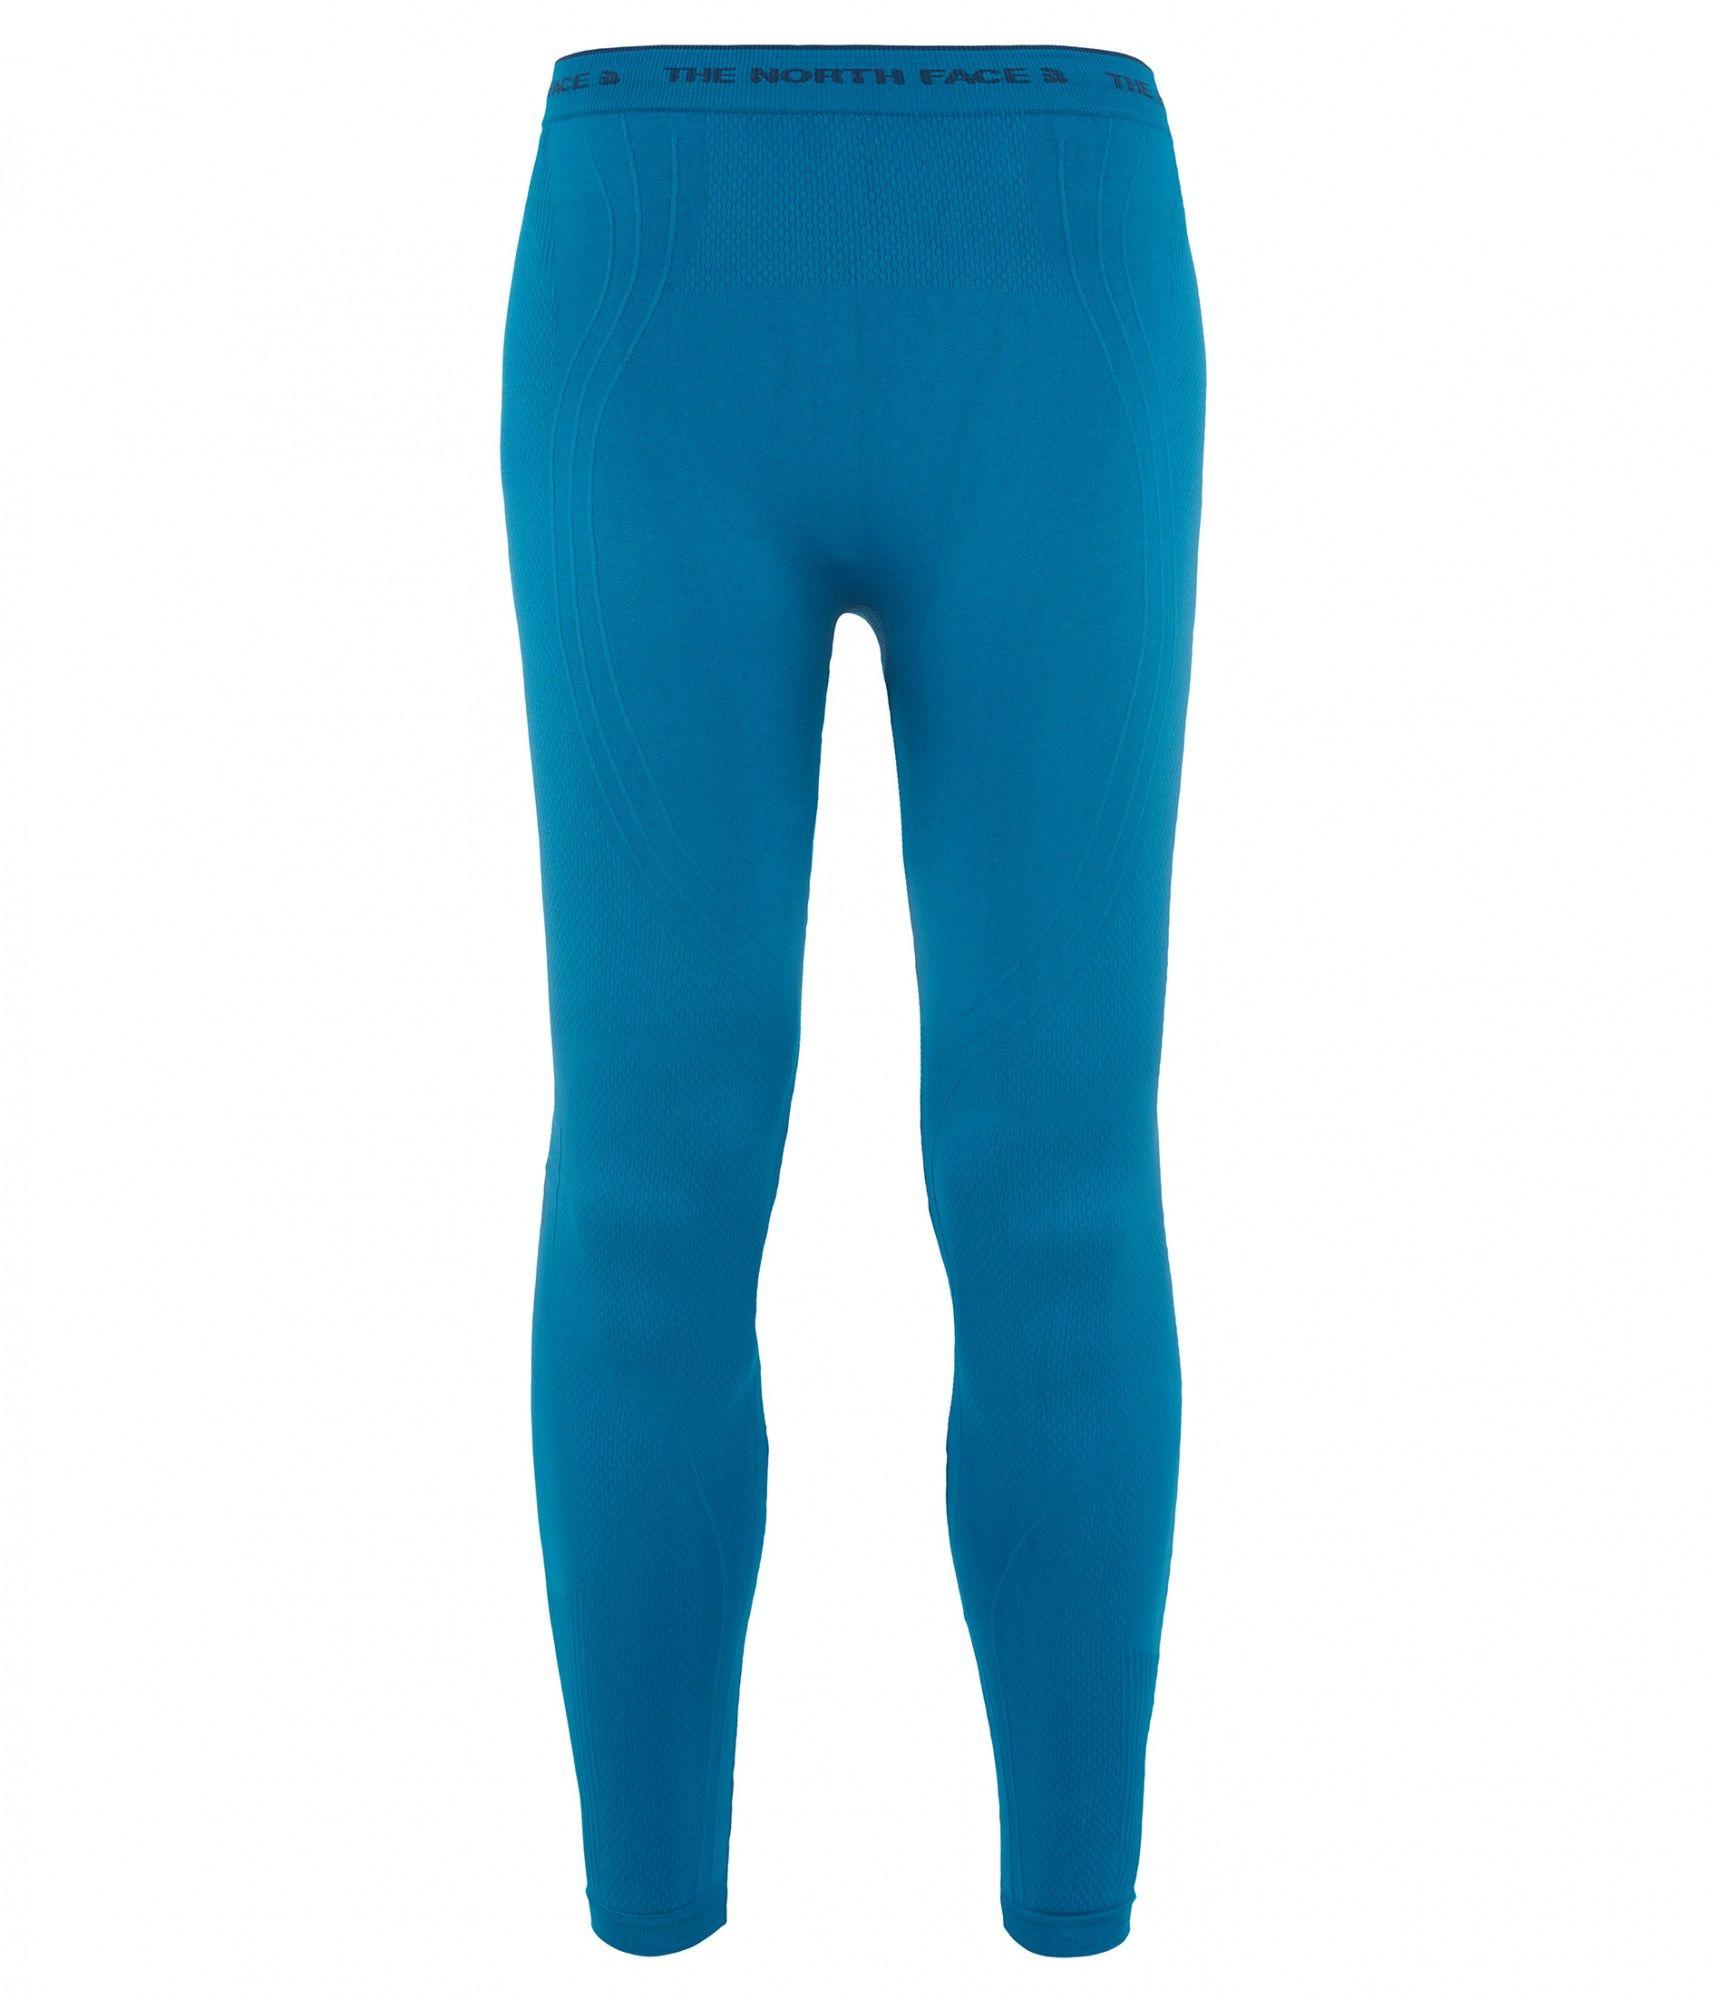 The North Face Hybrid Tights Blau, Female Tights, M/L